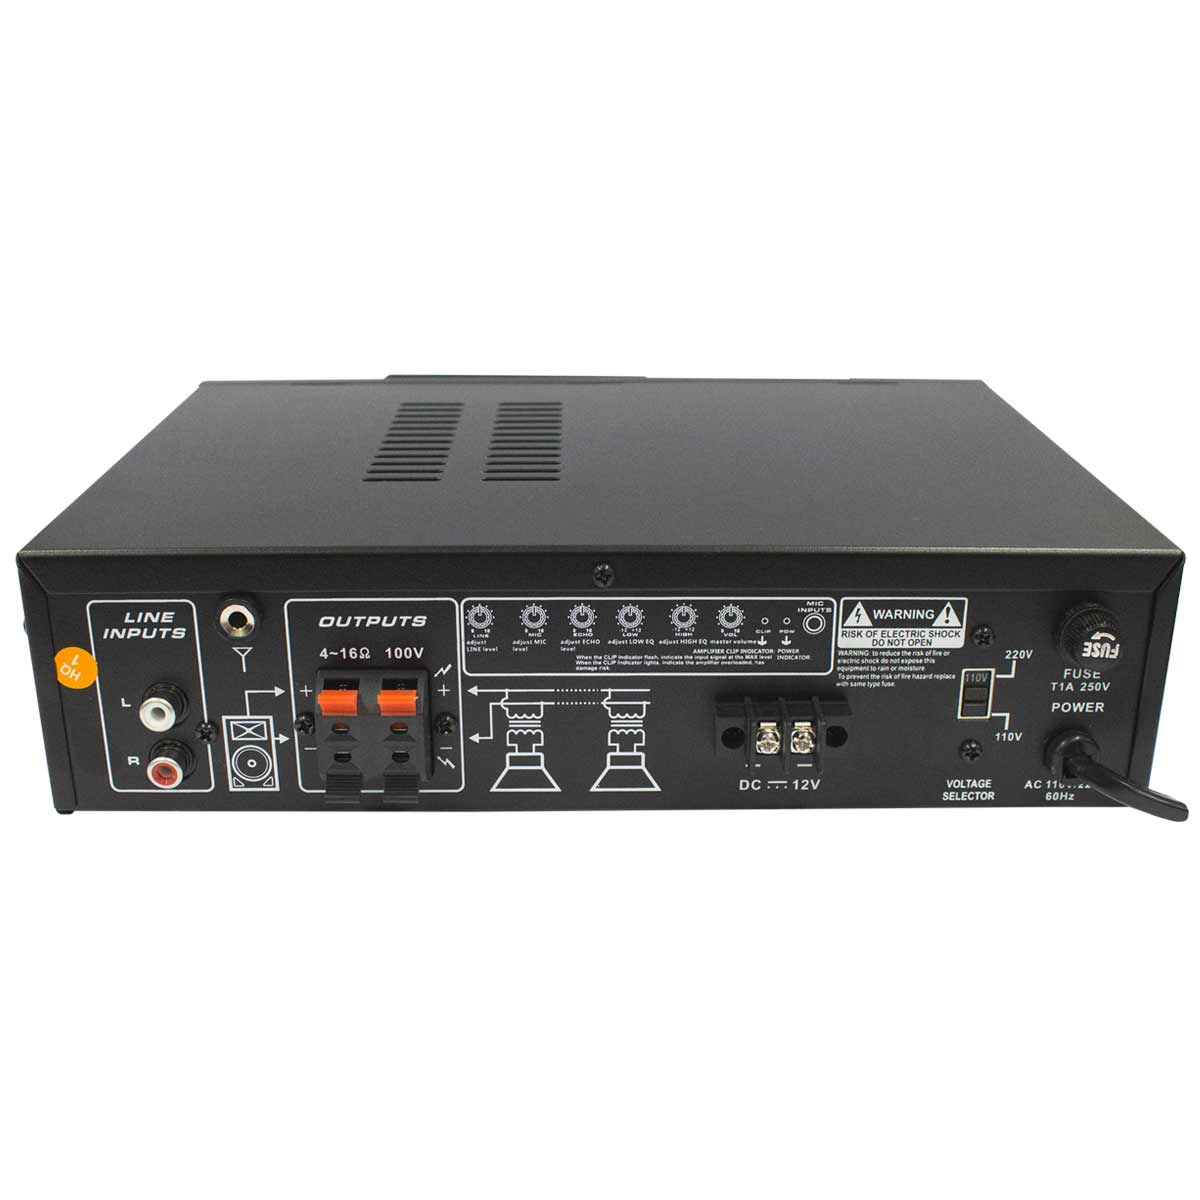 CSR535MUSBD - Amplificador 20W CSR 535M USB D - CSR